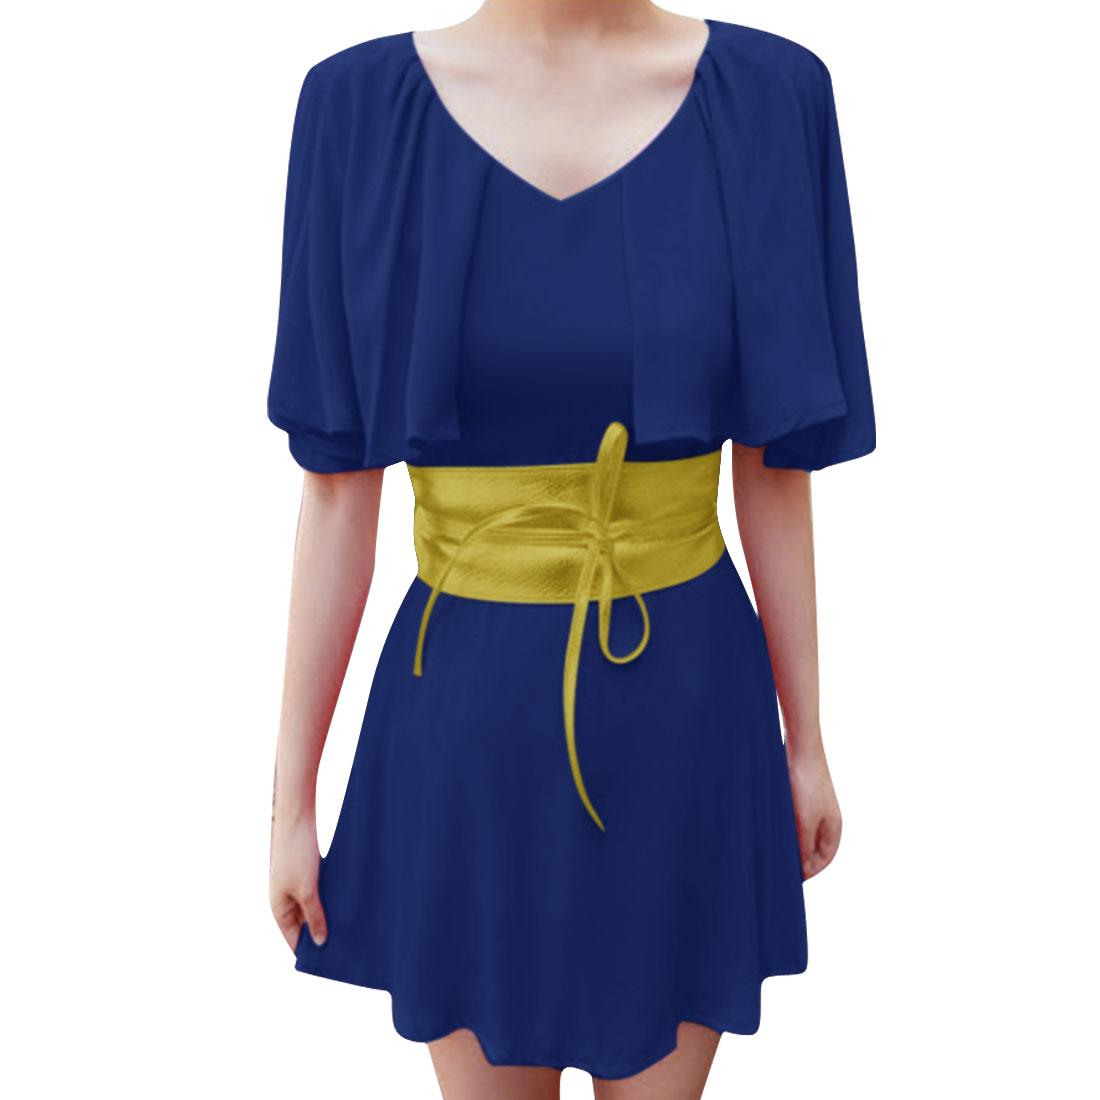 Women V Neck Split Sleeve Stylish Dress Royal Blue XS